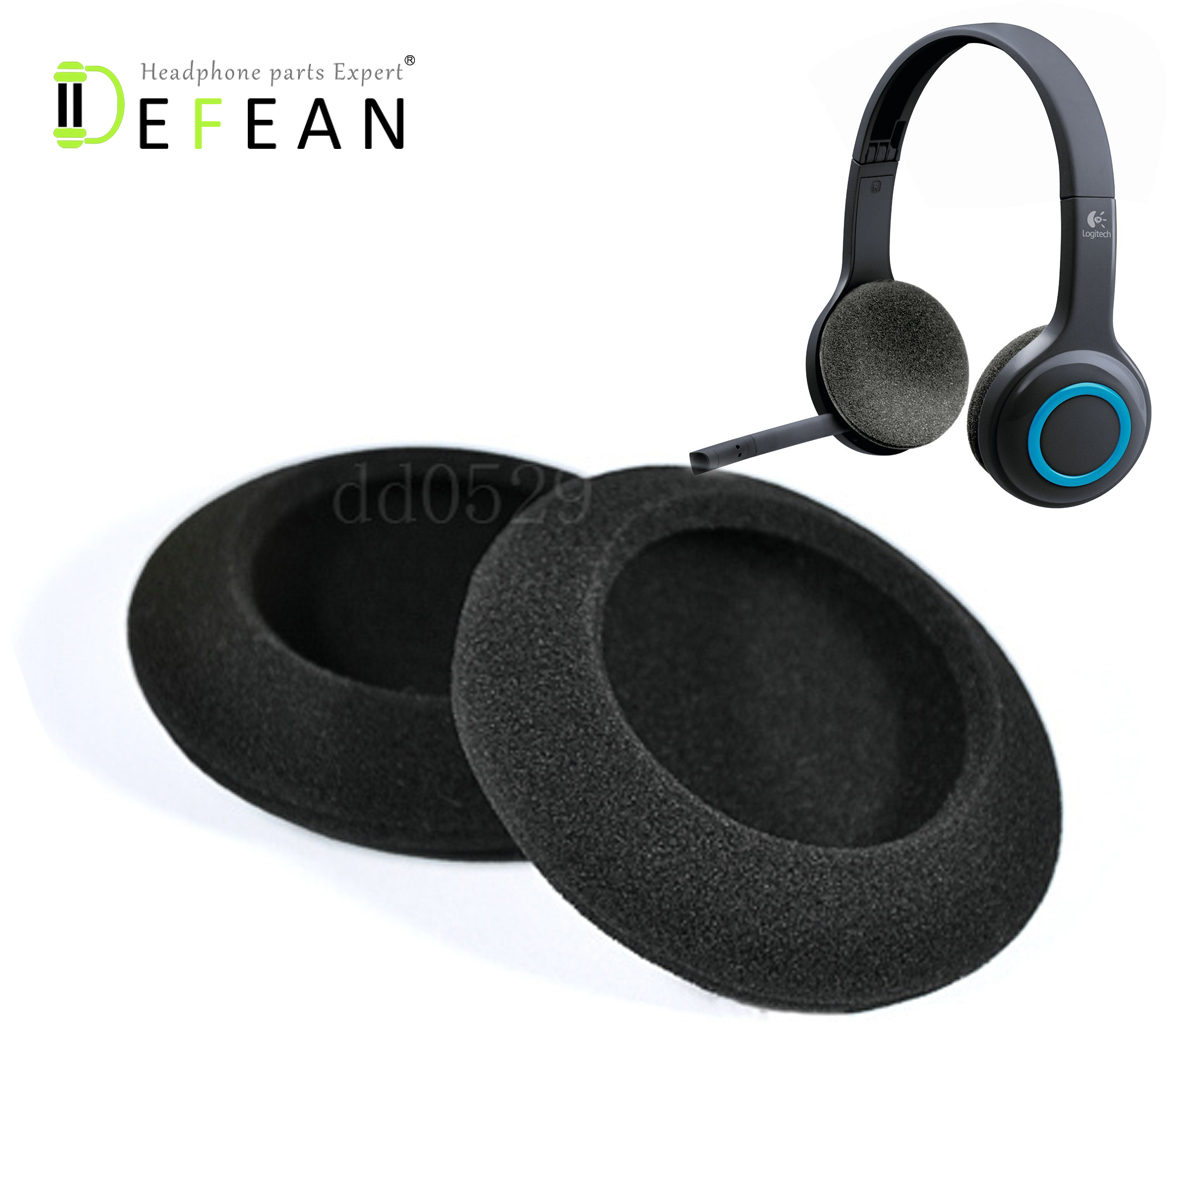 Logitech Over The Head Wireless Headset H600-in Headphone